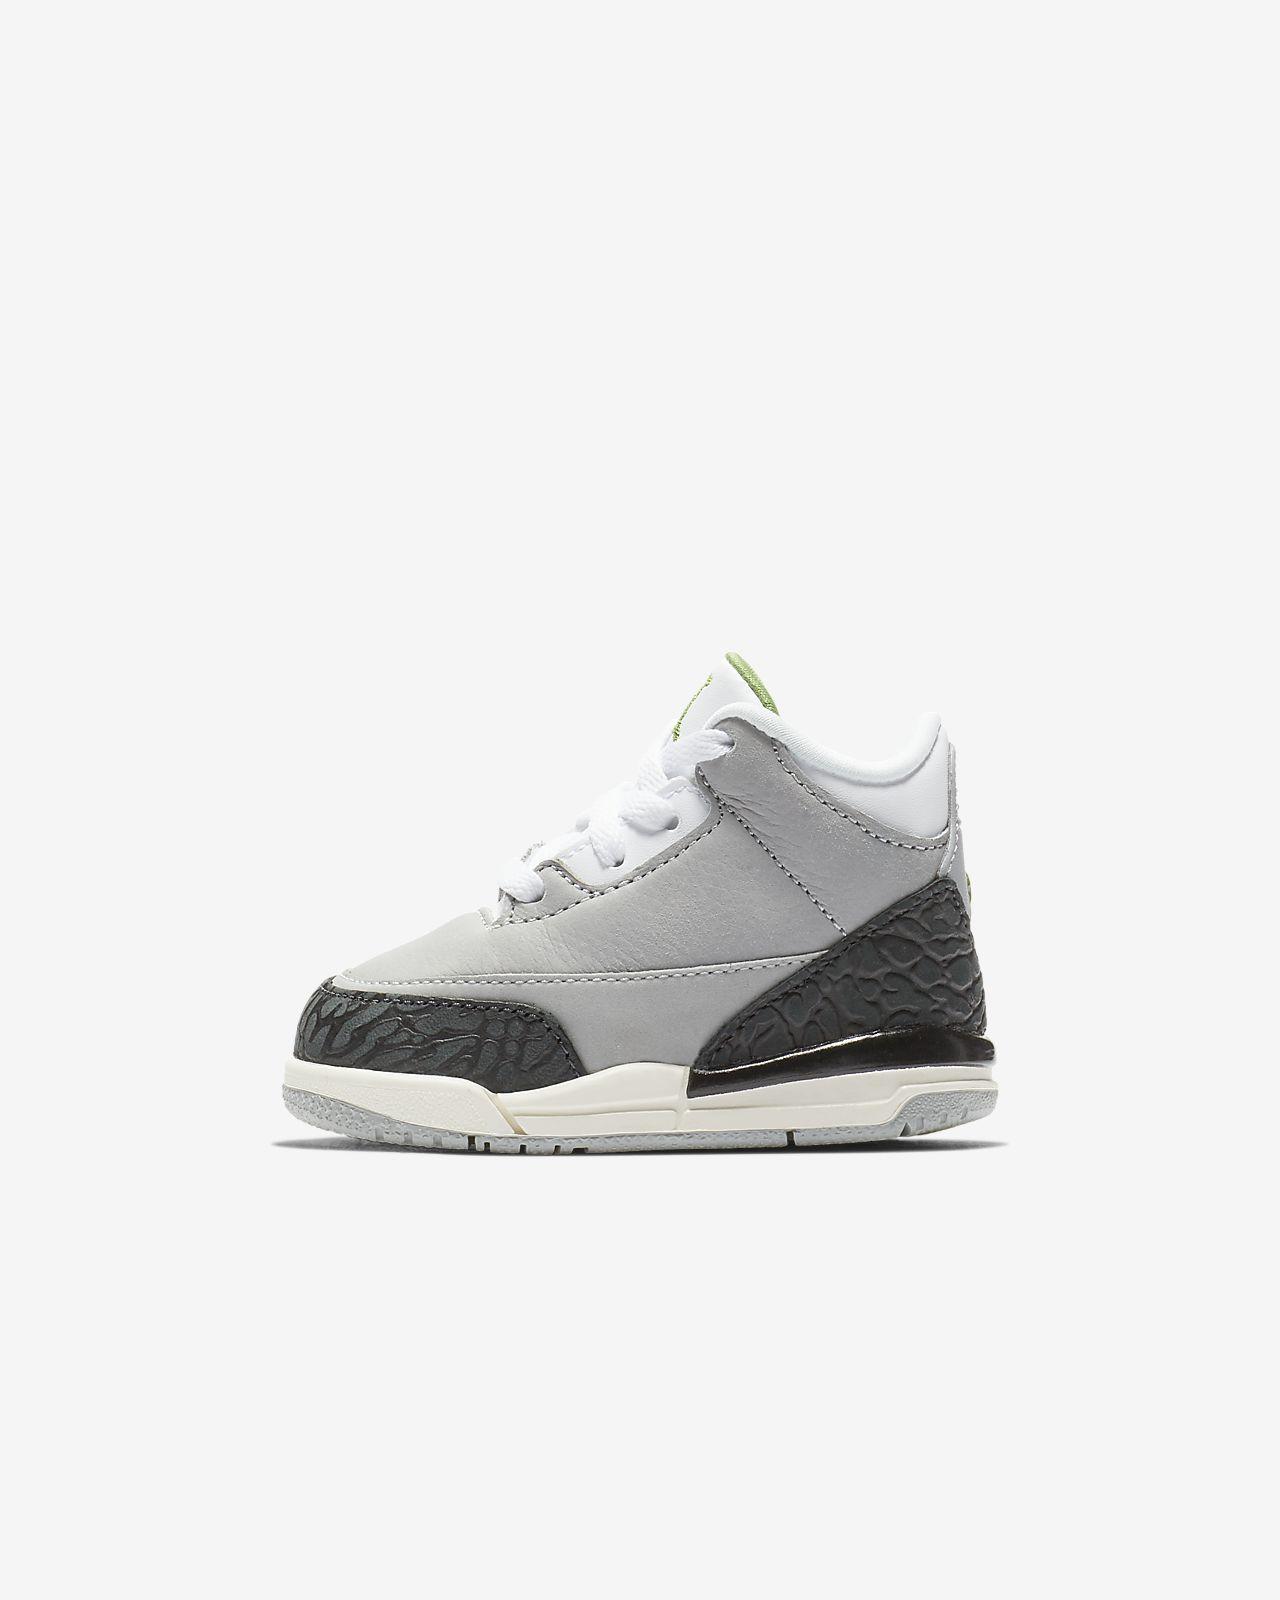 Air Jordan Retro 3 嬰幼兒鞋款